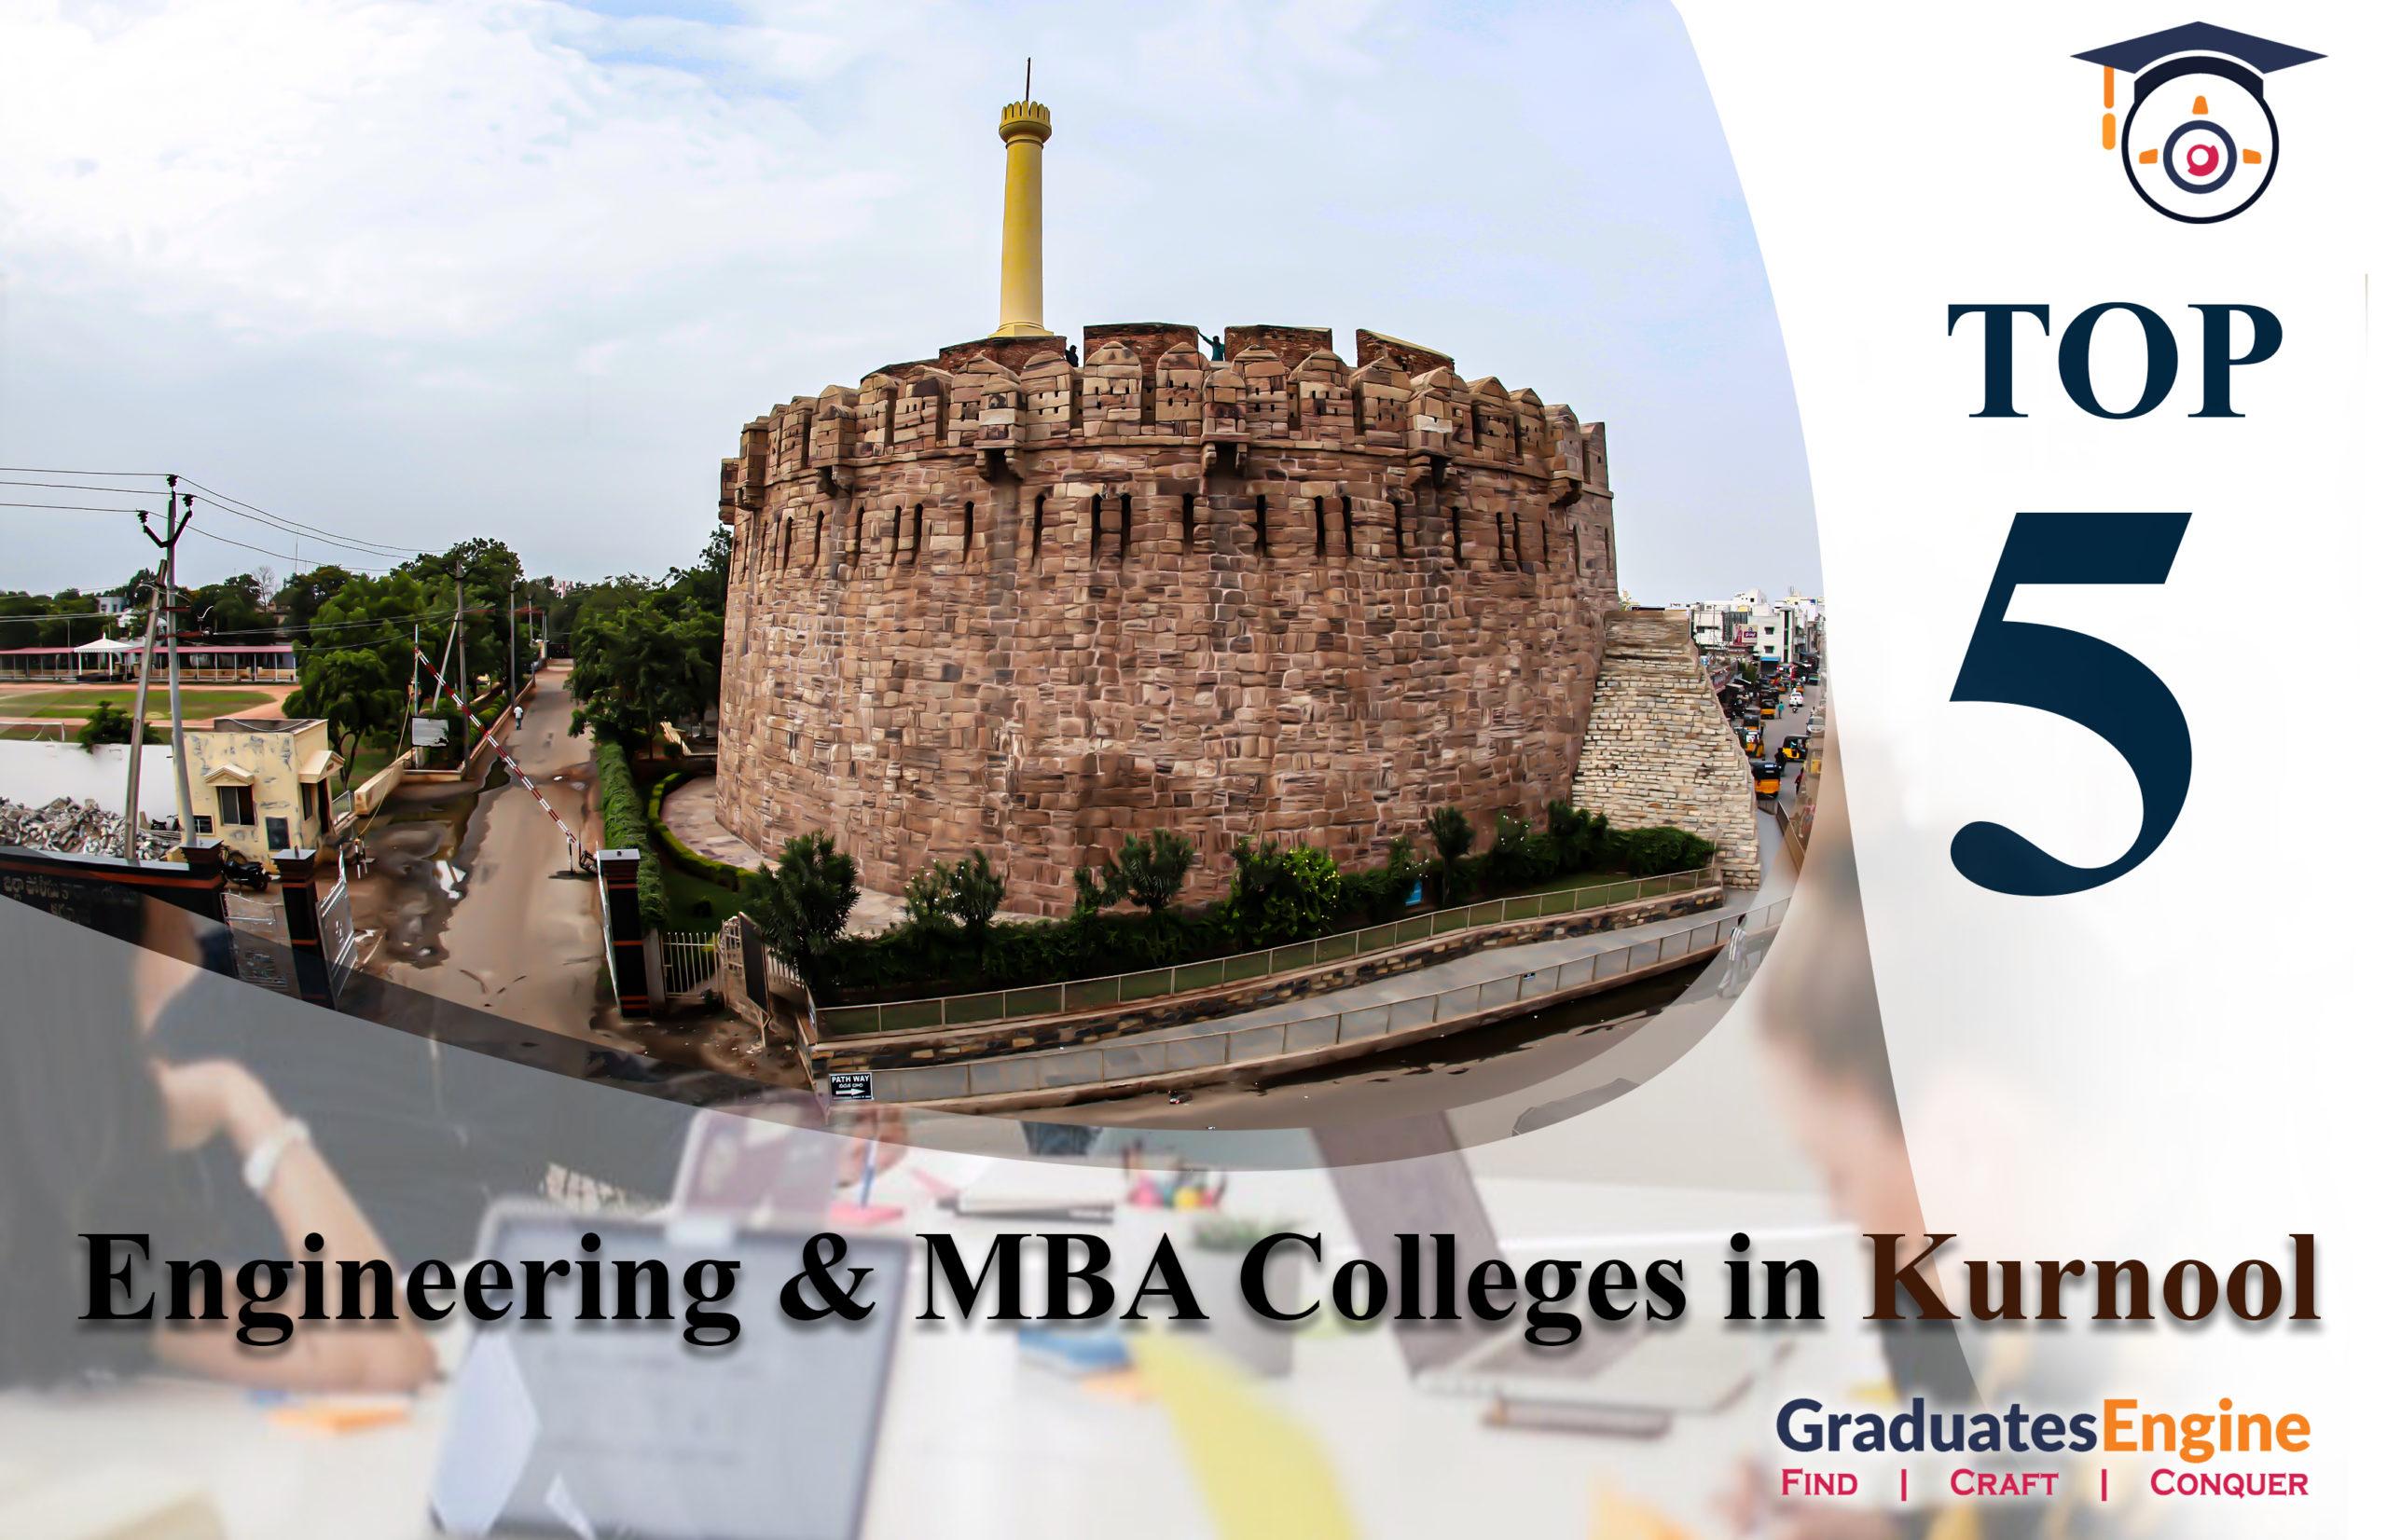 Top 5 Engineering Colleges in Kurnool